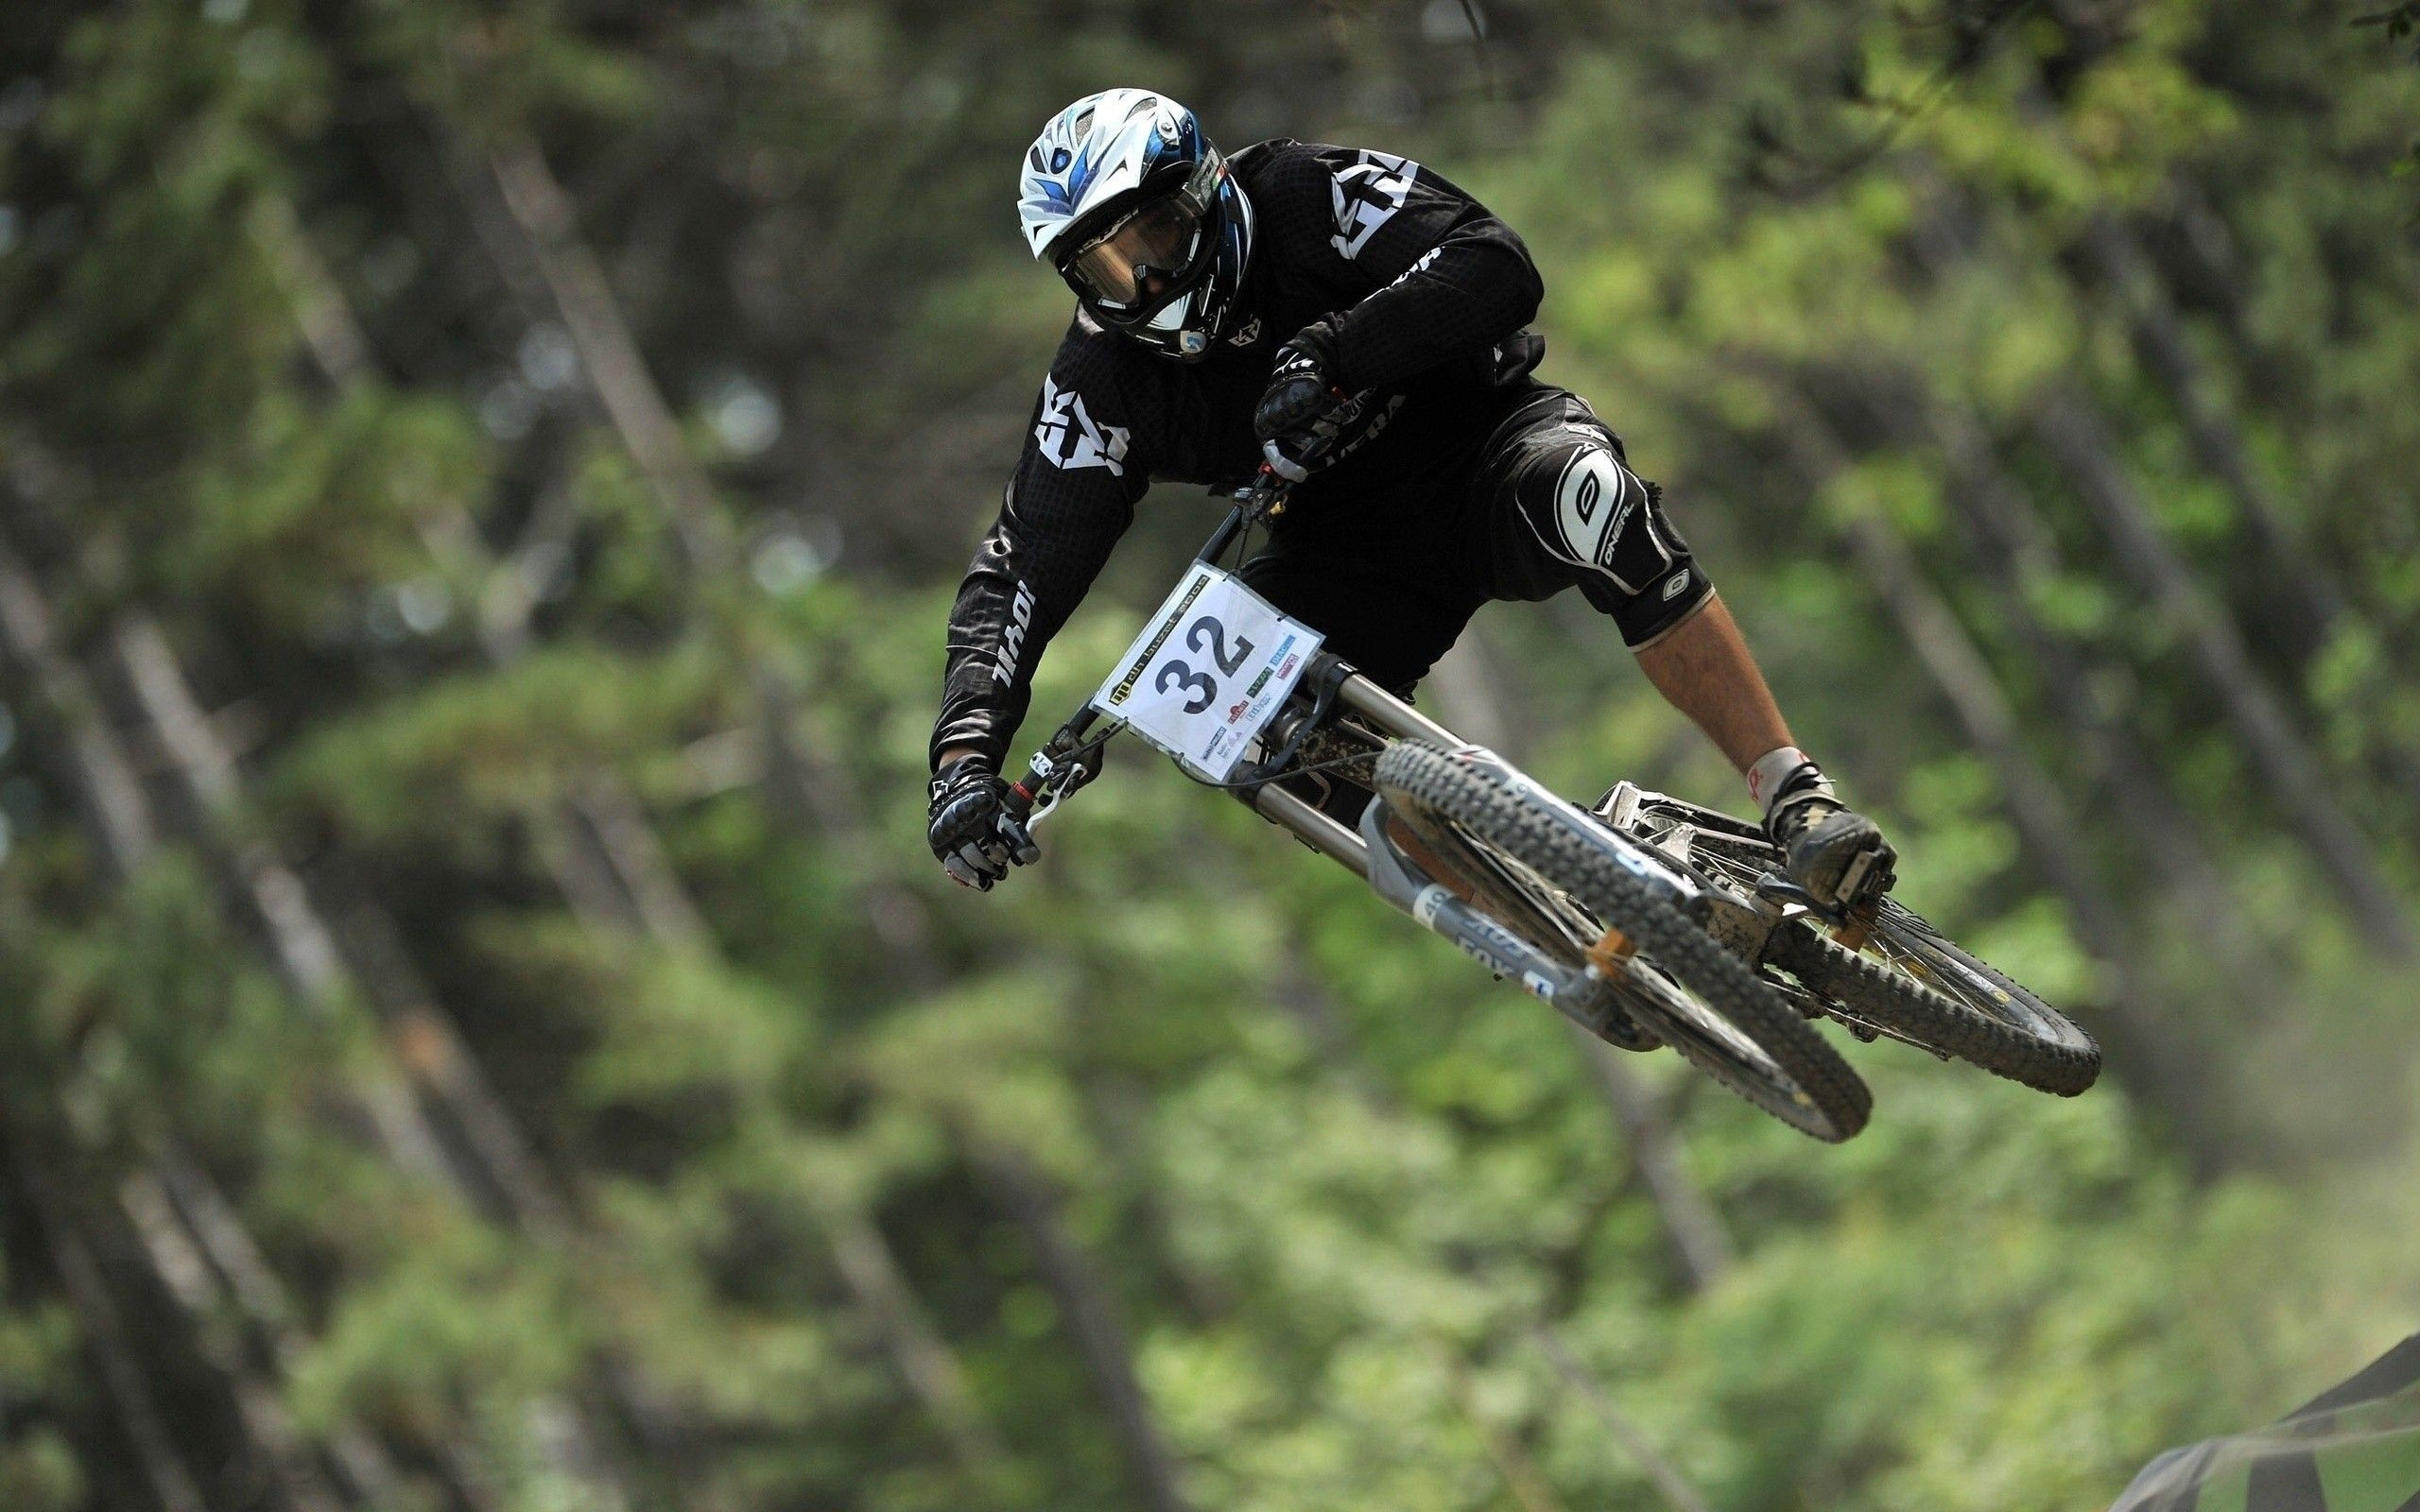 28724 descargar fondo de pantalla Deportes, Personas, Hombres, Bicicletas: protectores de pantalla e imágenes gratis